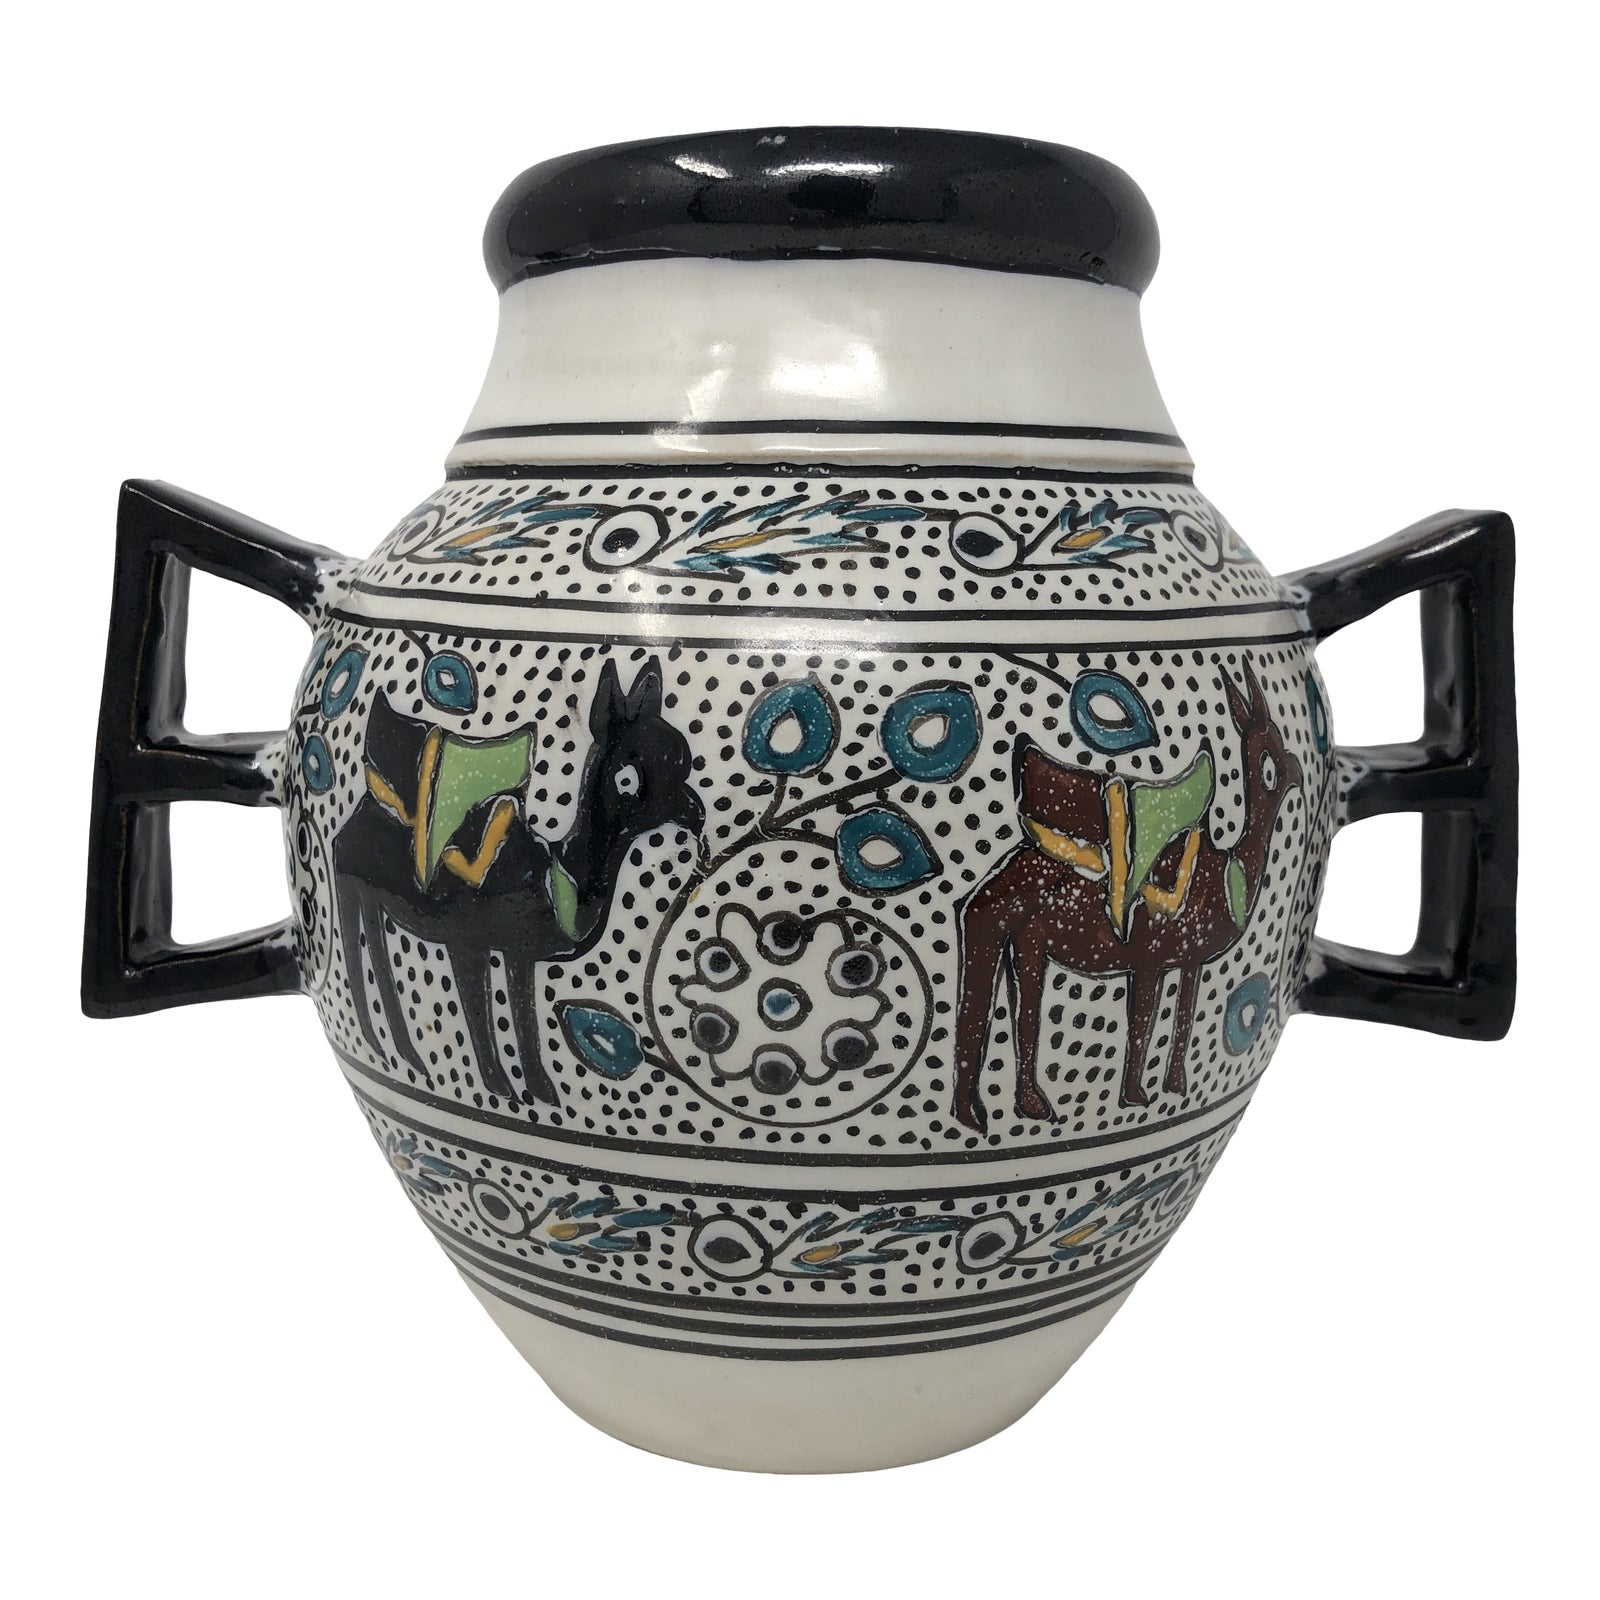 Vintage Signed Middle Eastern Persian Pottery Vase